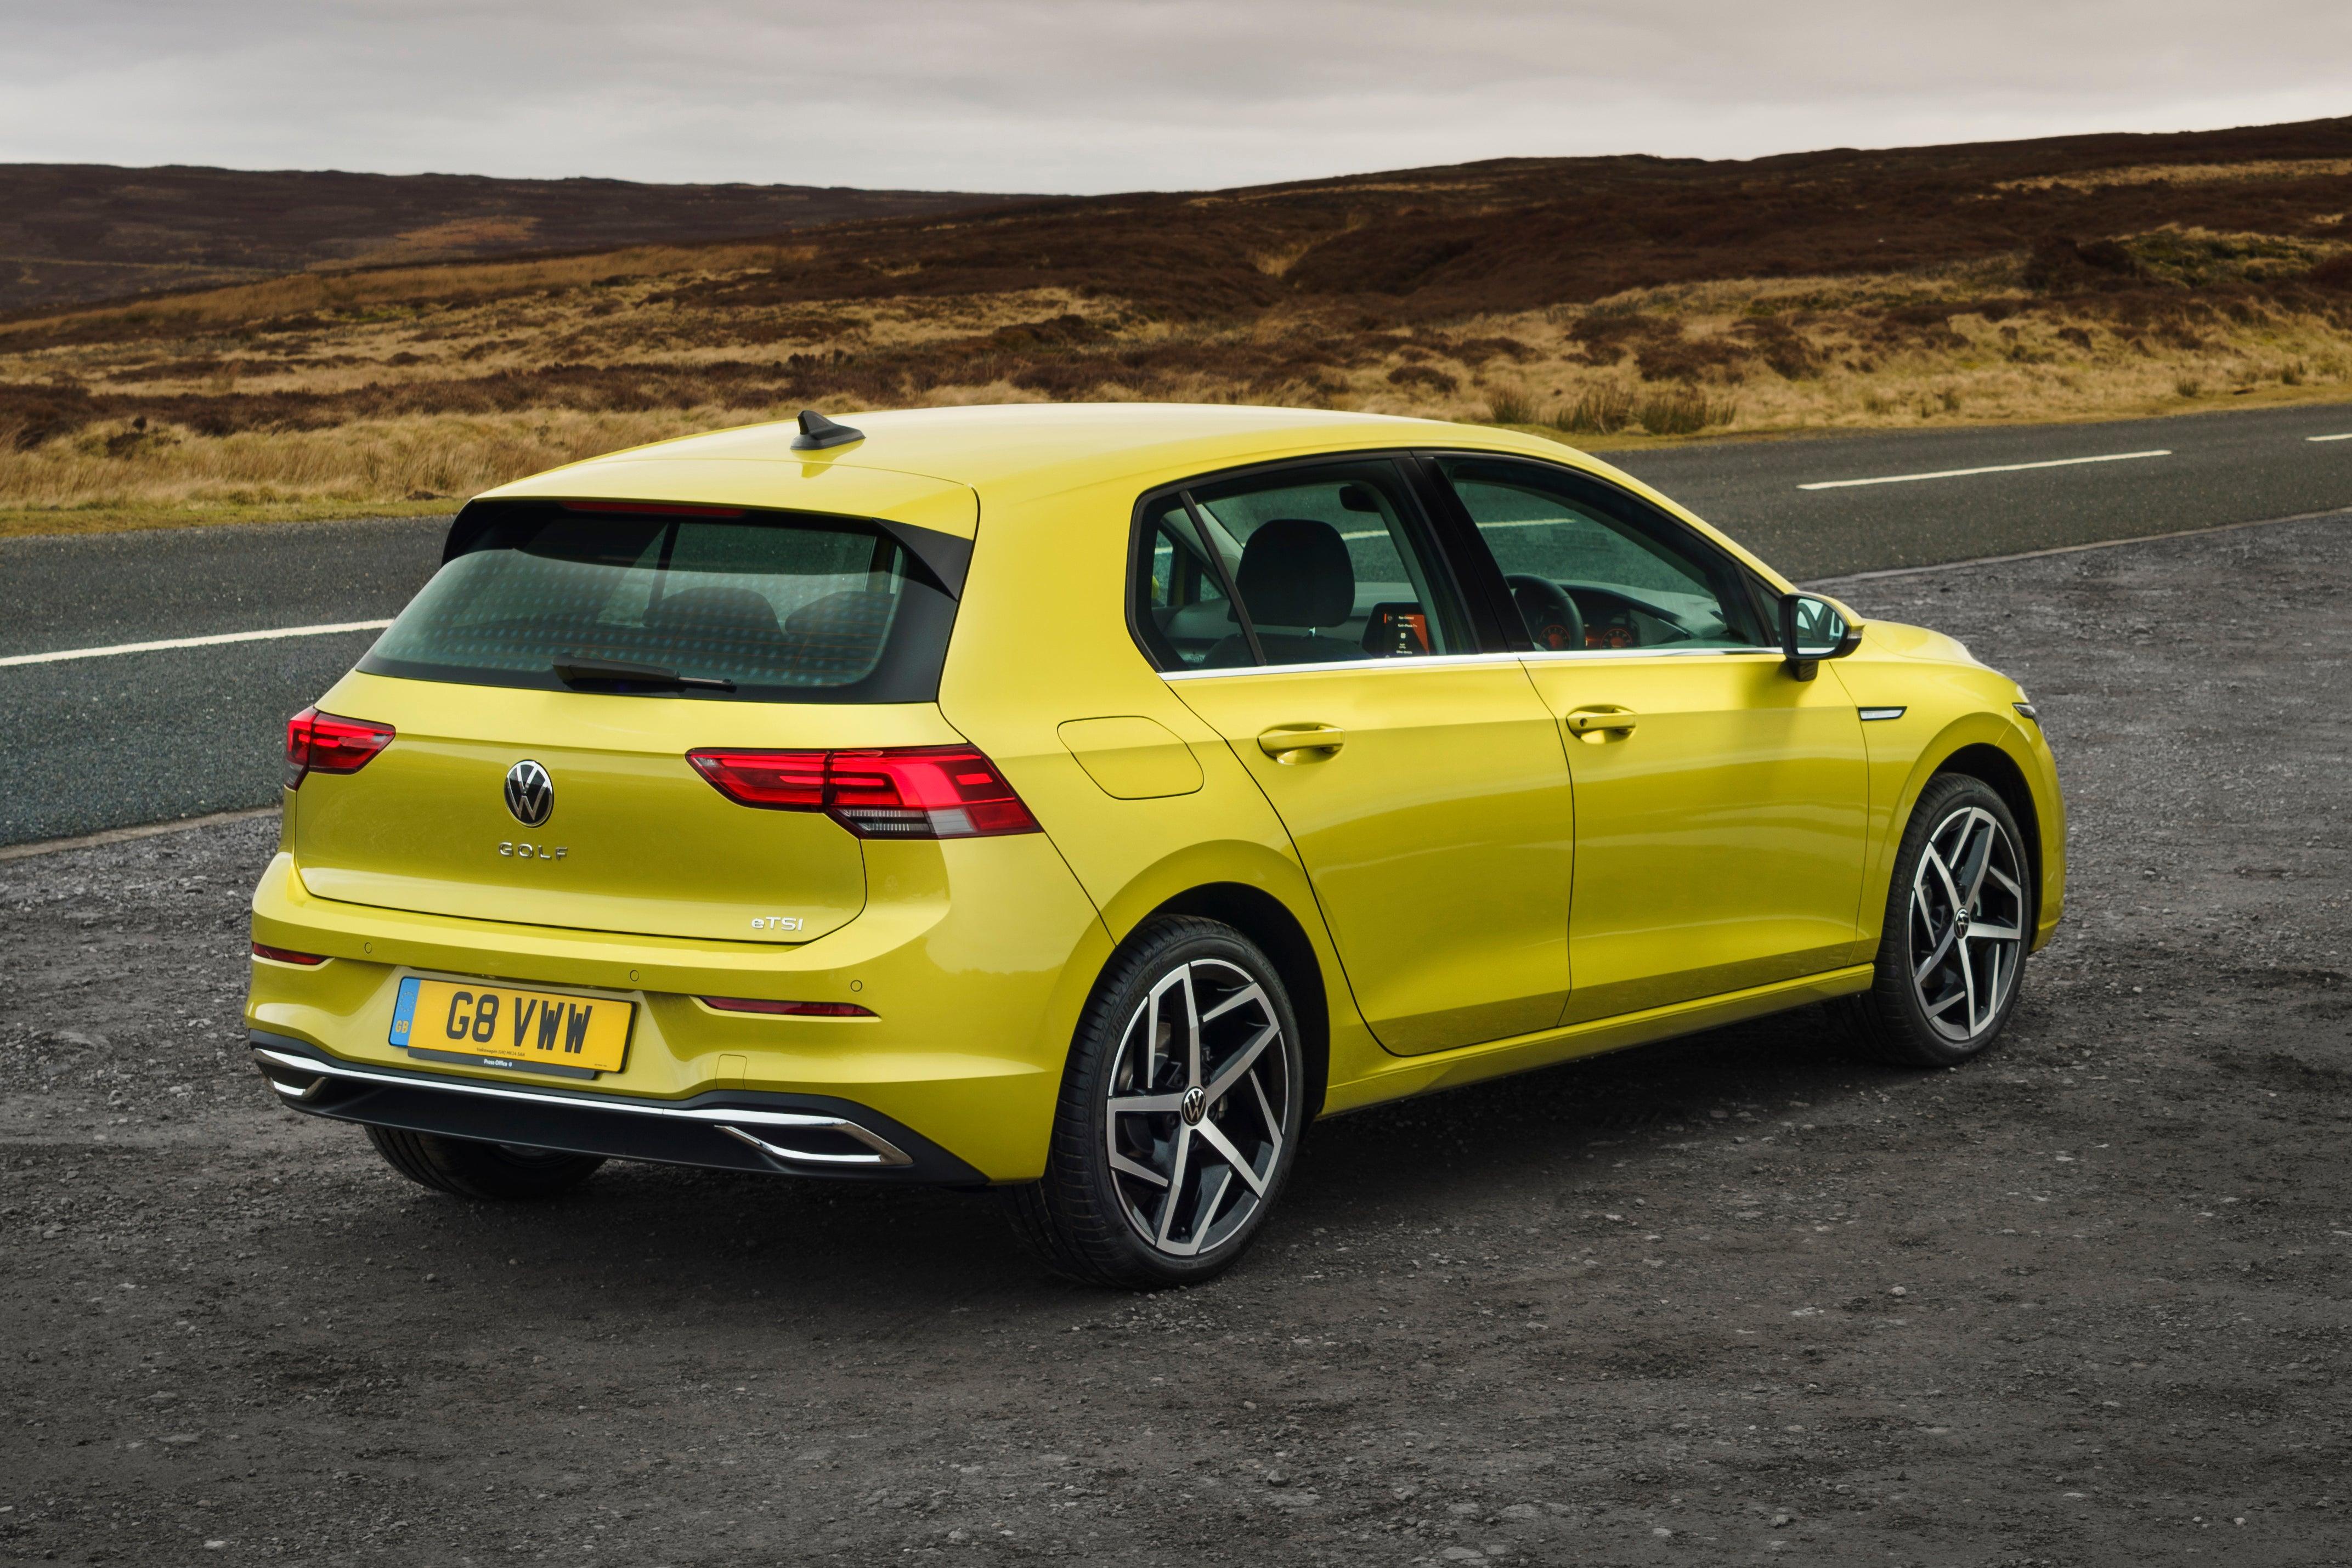 Volkswagen Golf Side Rear View